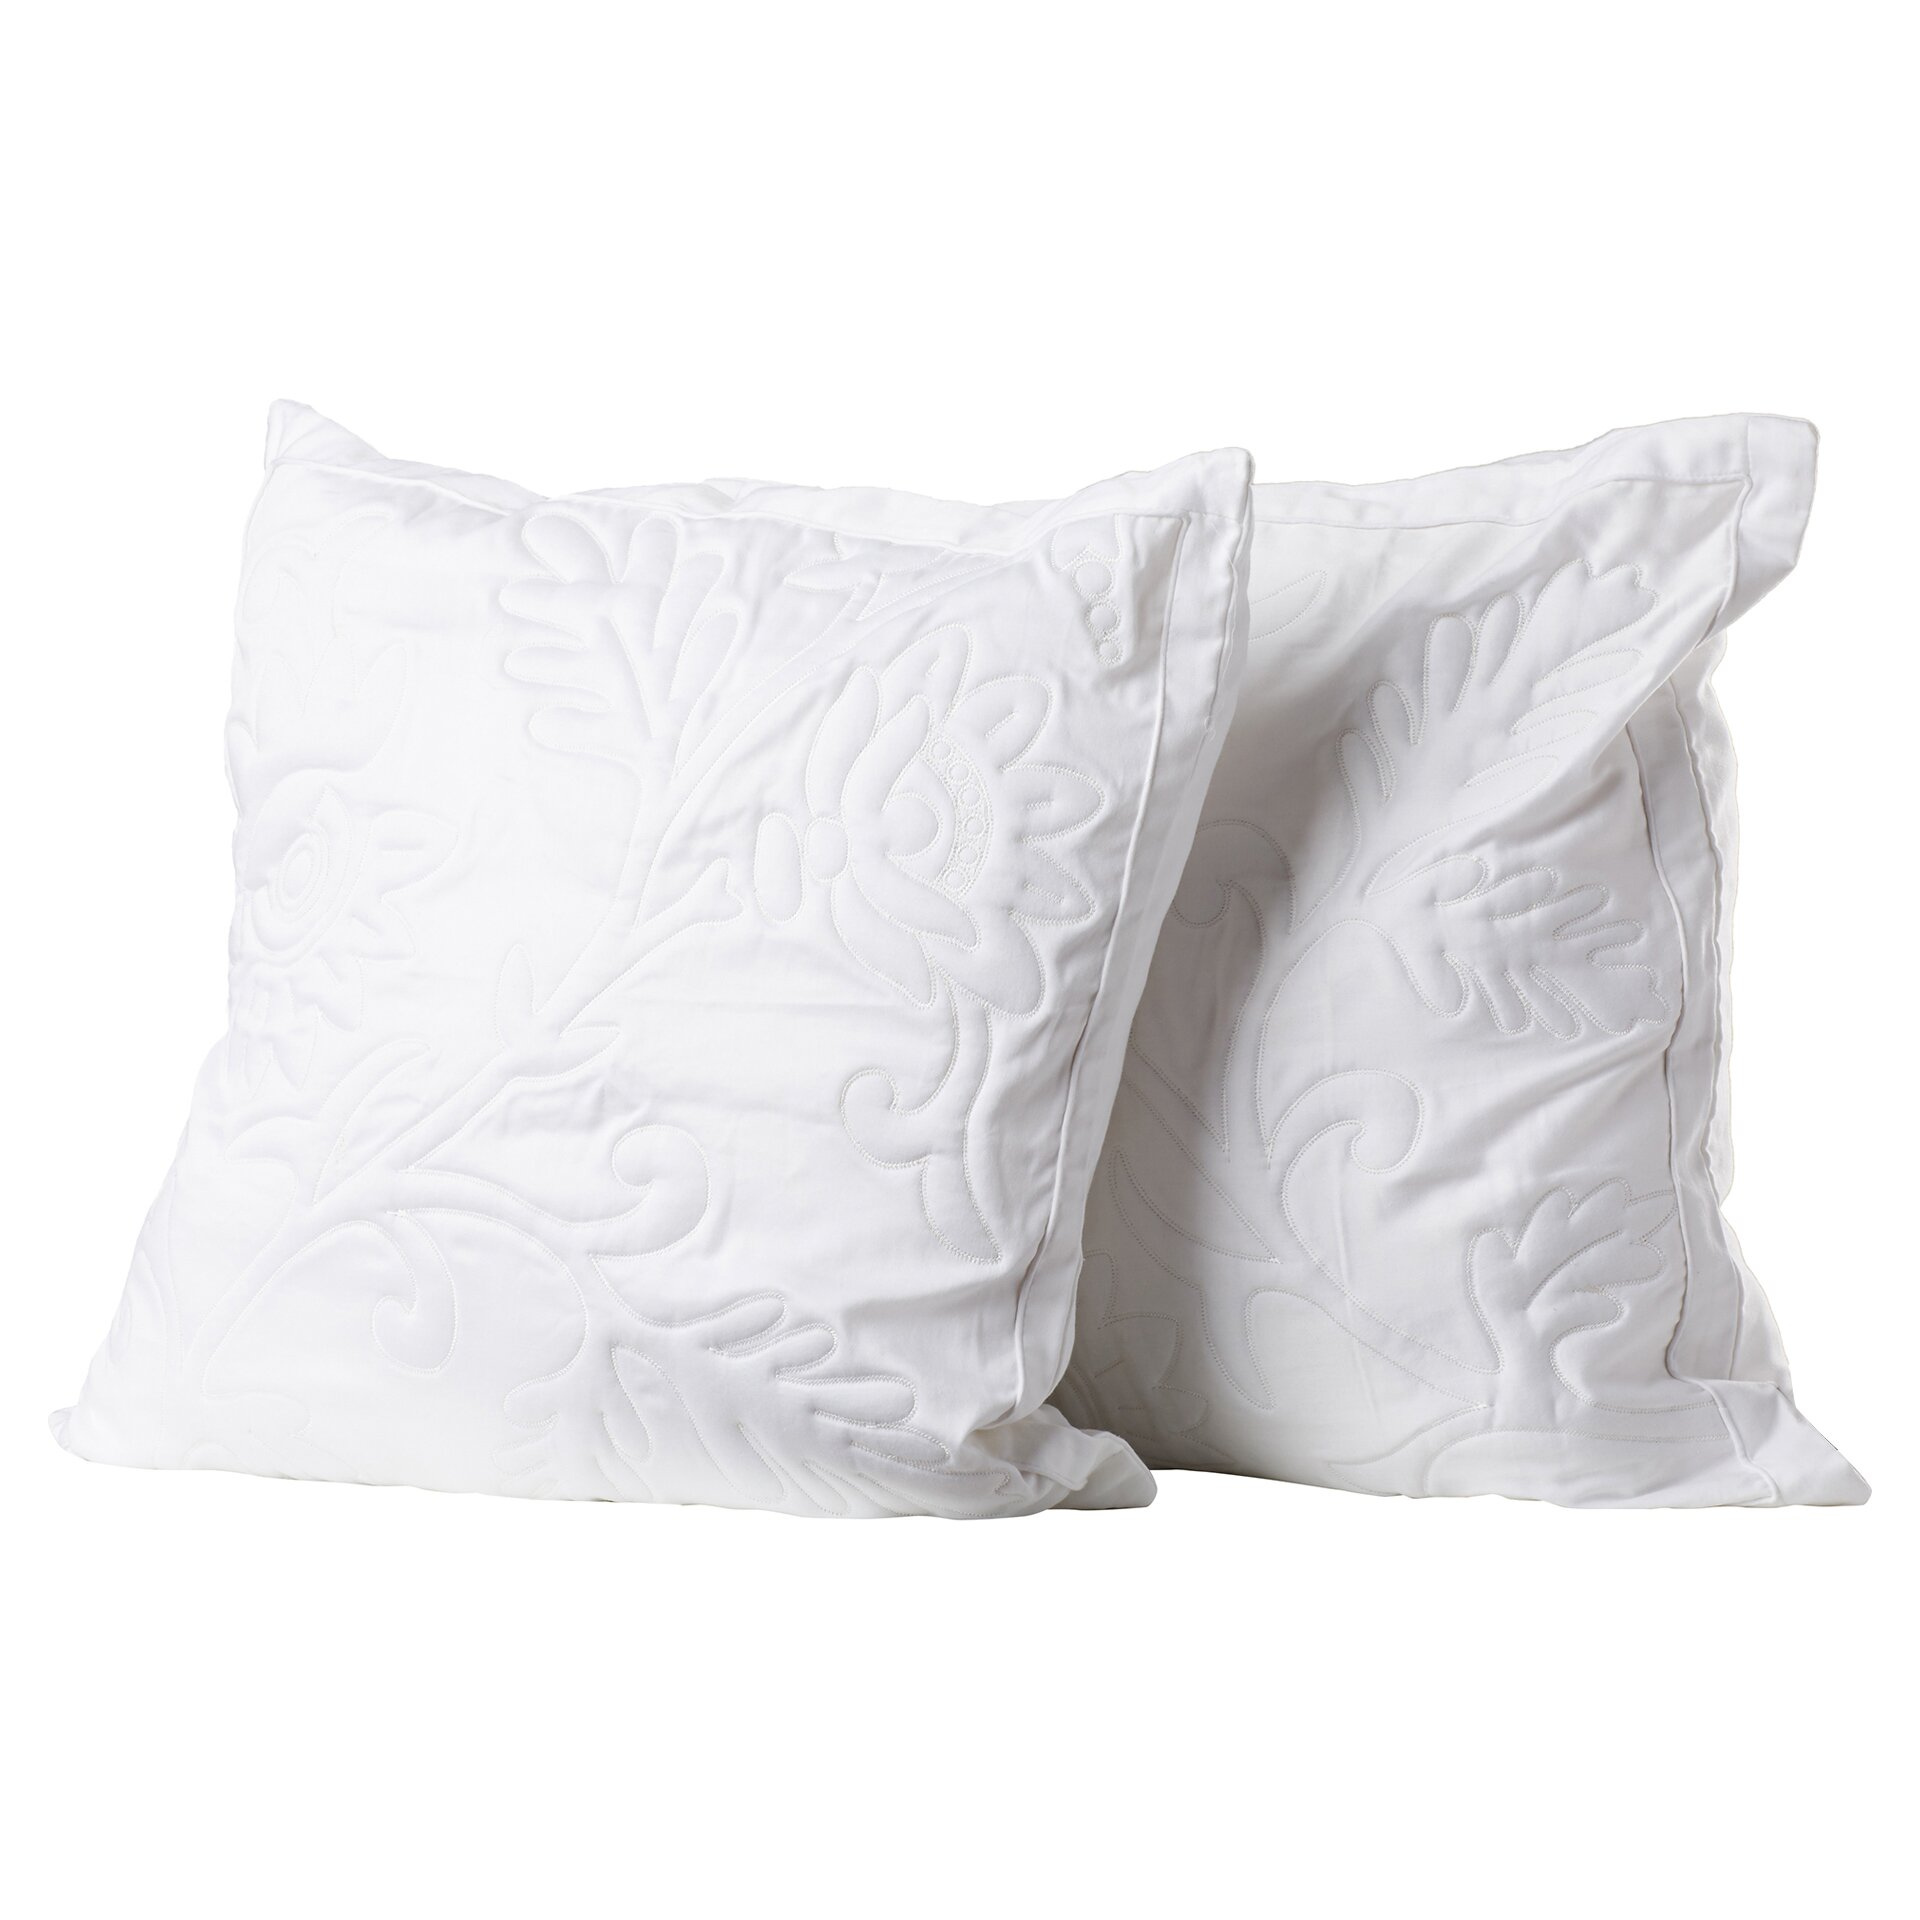 Quality Throw Pillows : One Allium Way Opal Quilted Throw Pillow & Reviews Wayfair